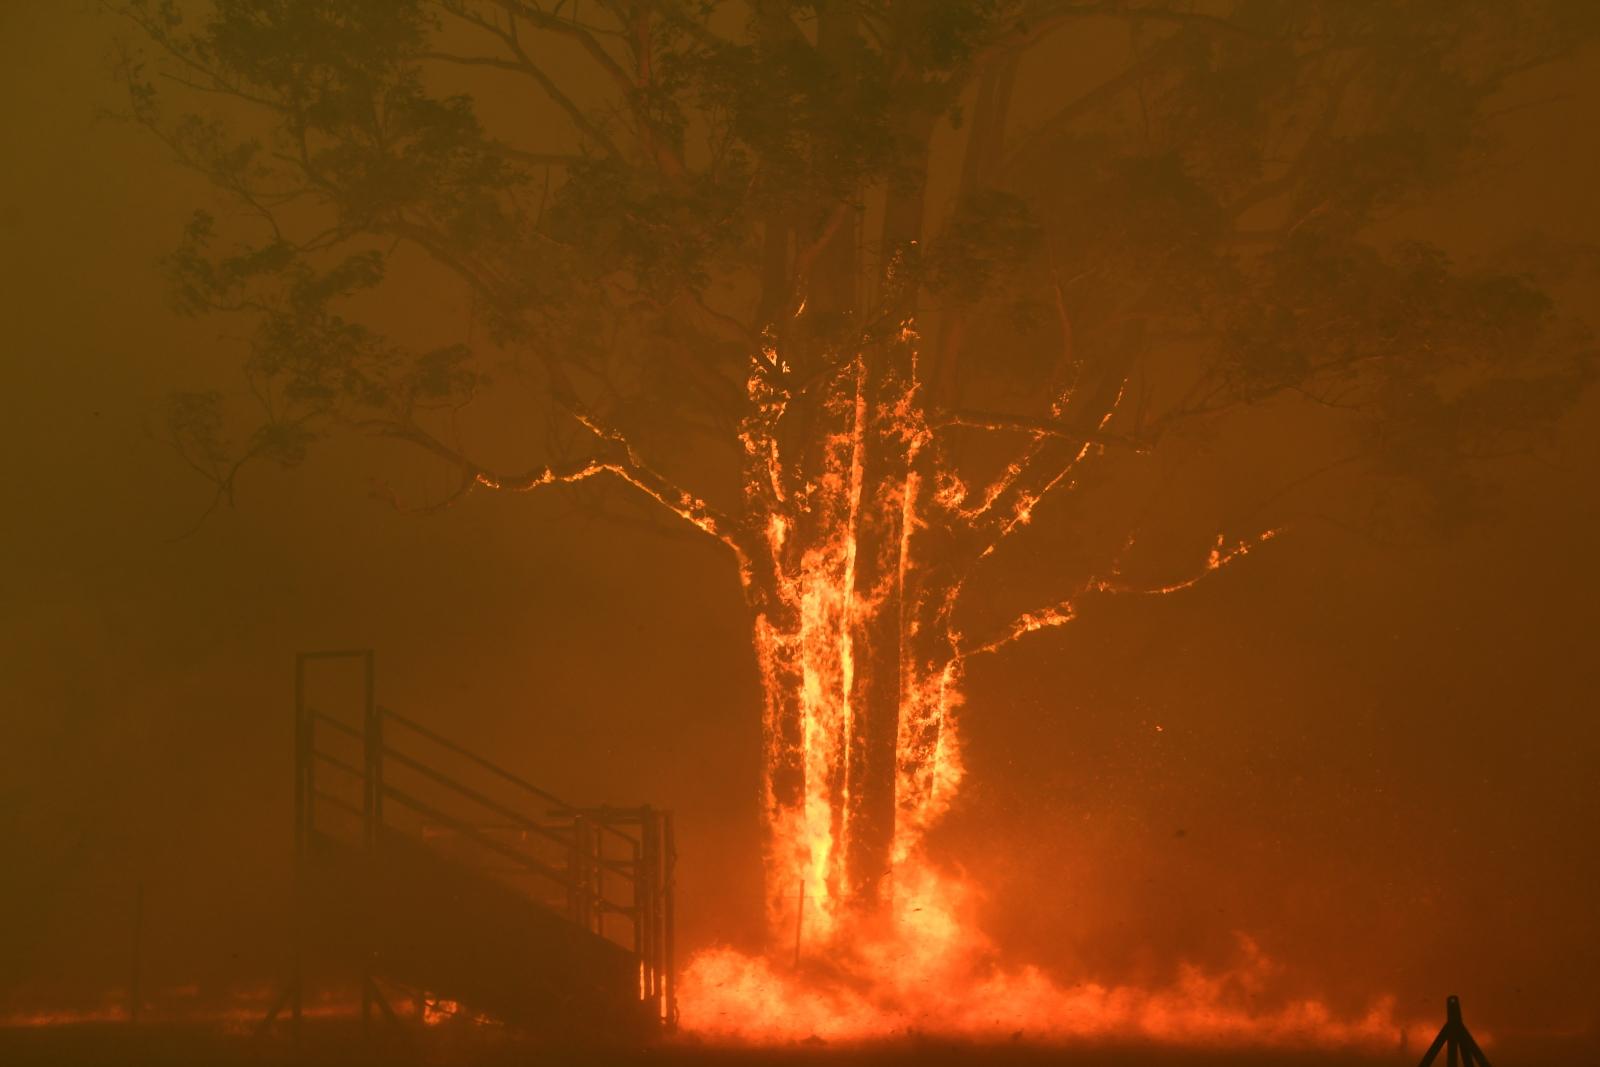 Pożary buszu w Australii  EPA/DEAN LEWINS